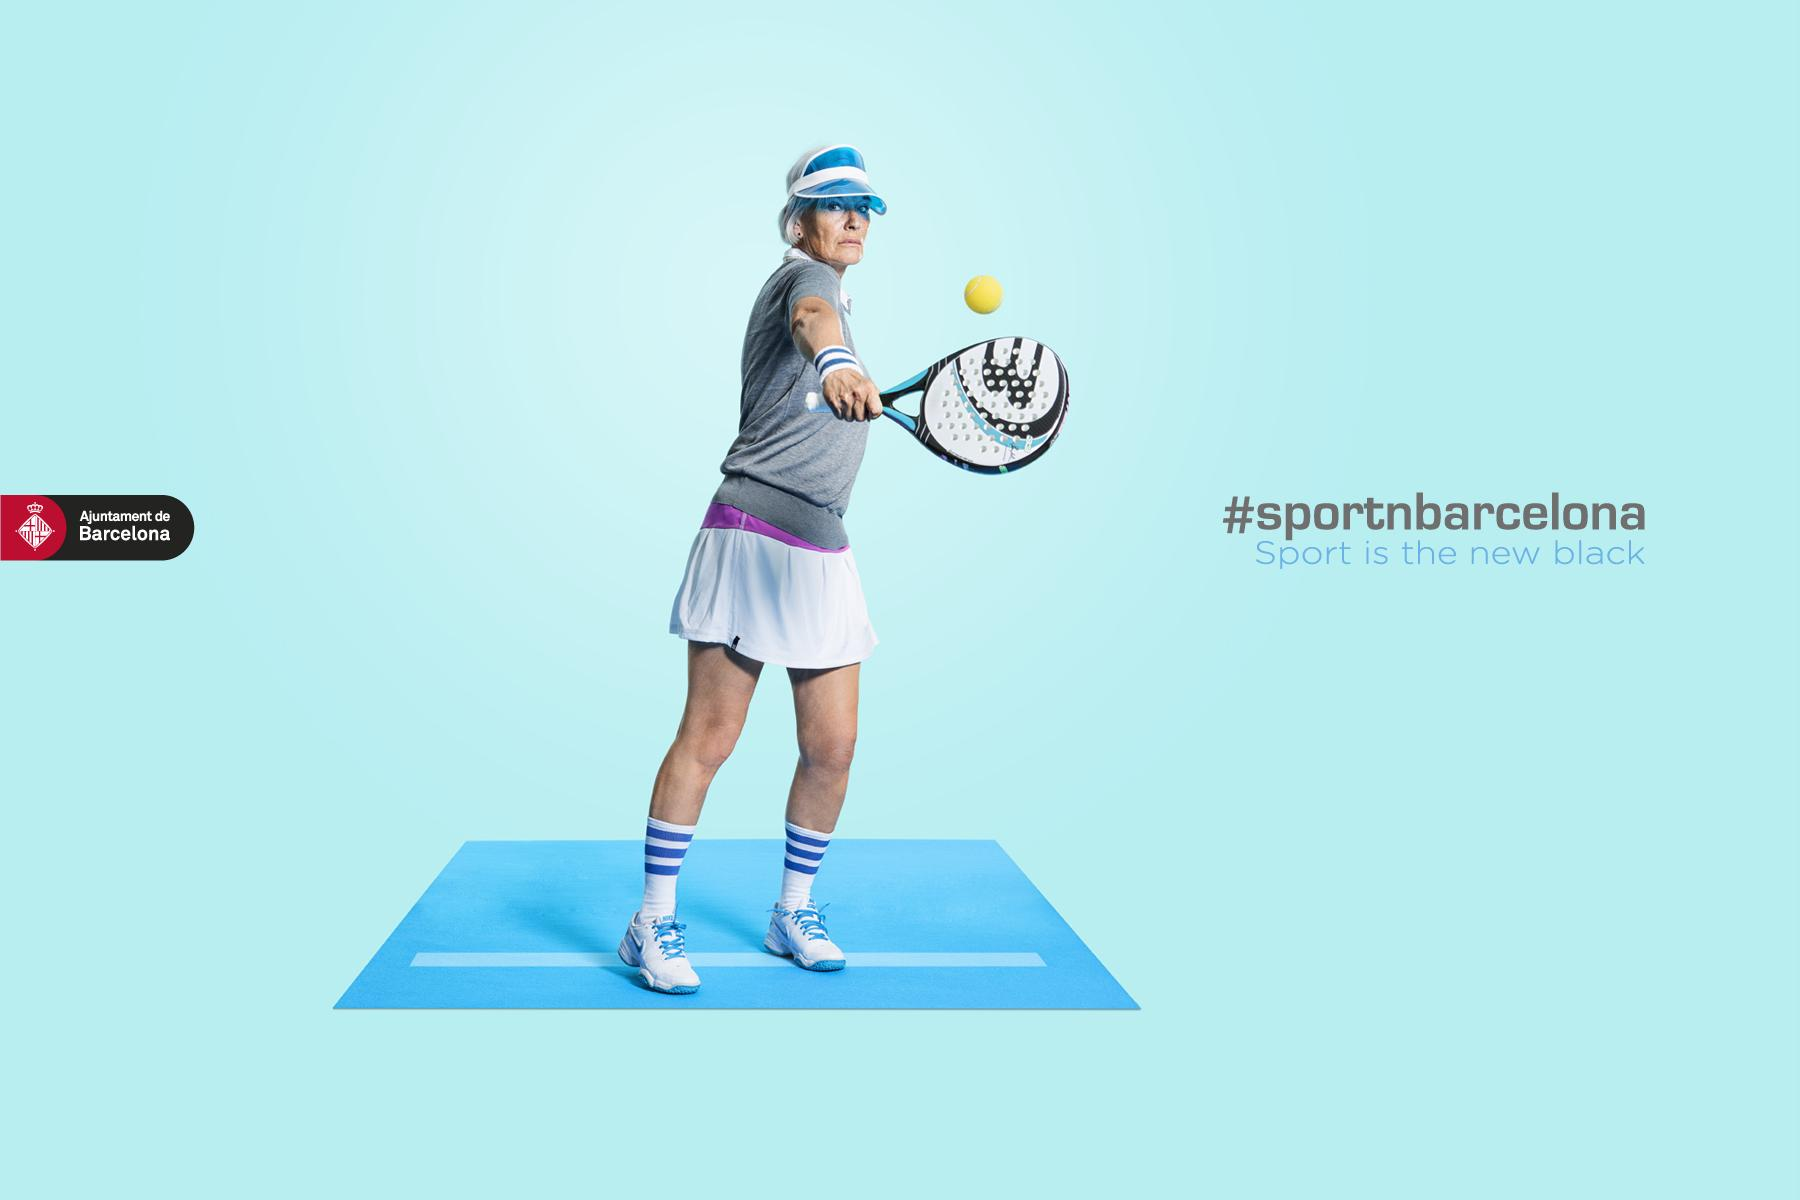 Barcelona City Council Print Ad -  #sportnbarcelona, 2